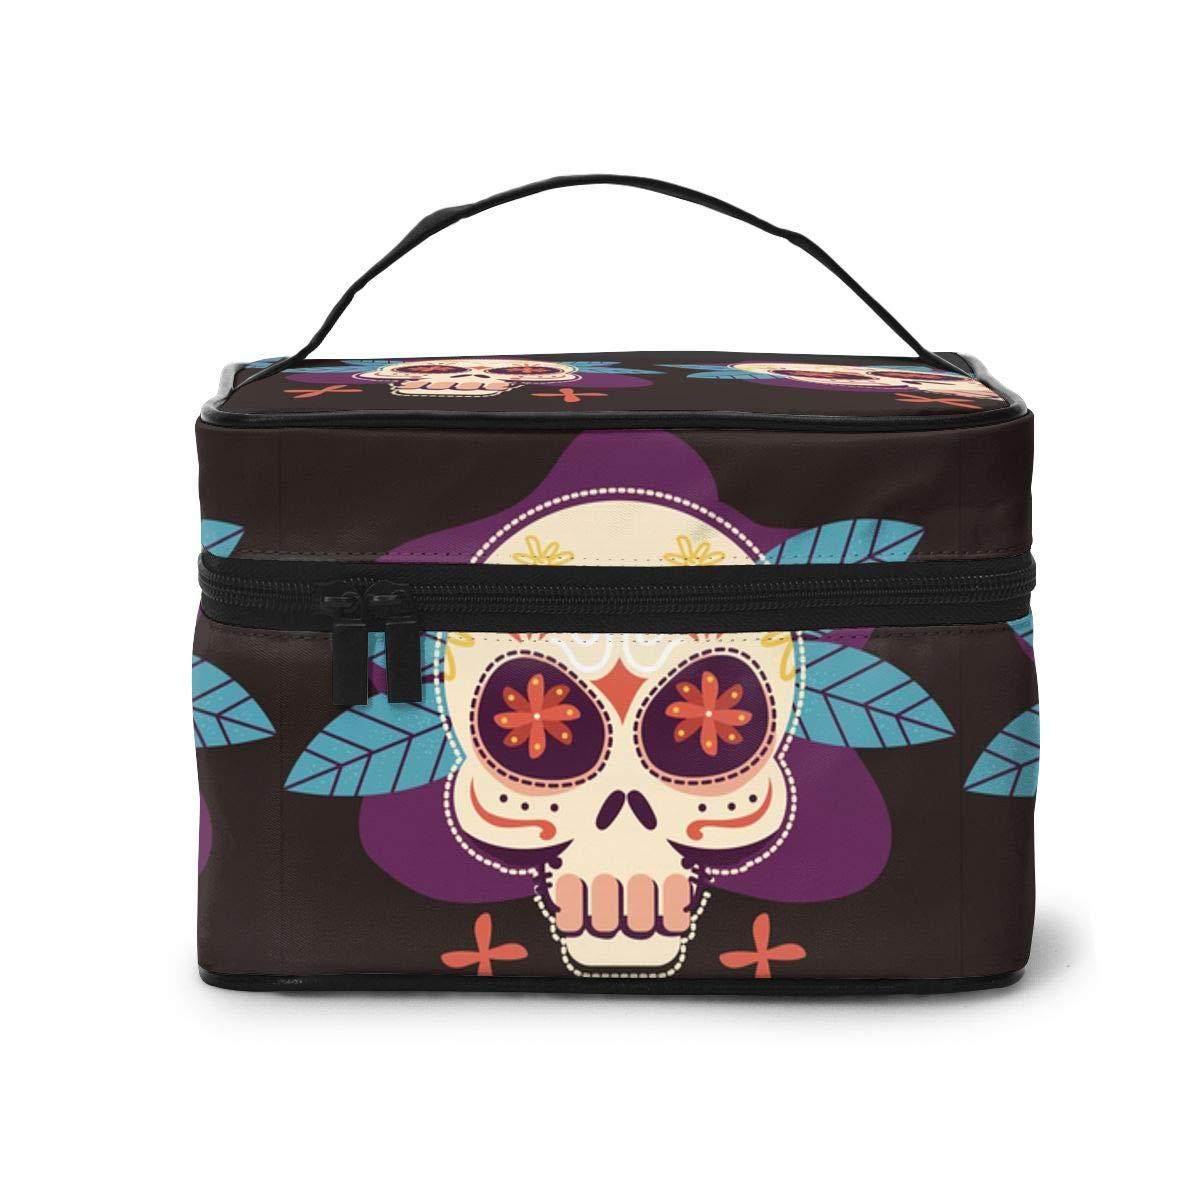 Tengyiyi Creative Skull Makeup Bag Travel Toiletry BOX Portable Organizer Storage Cosmetic Train Case For Women Girls